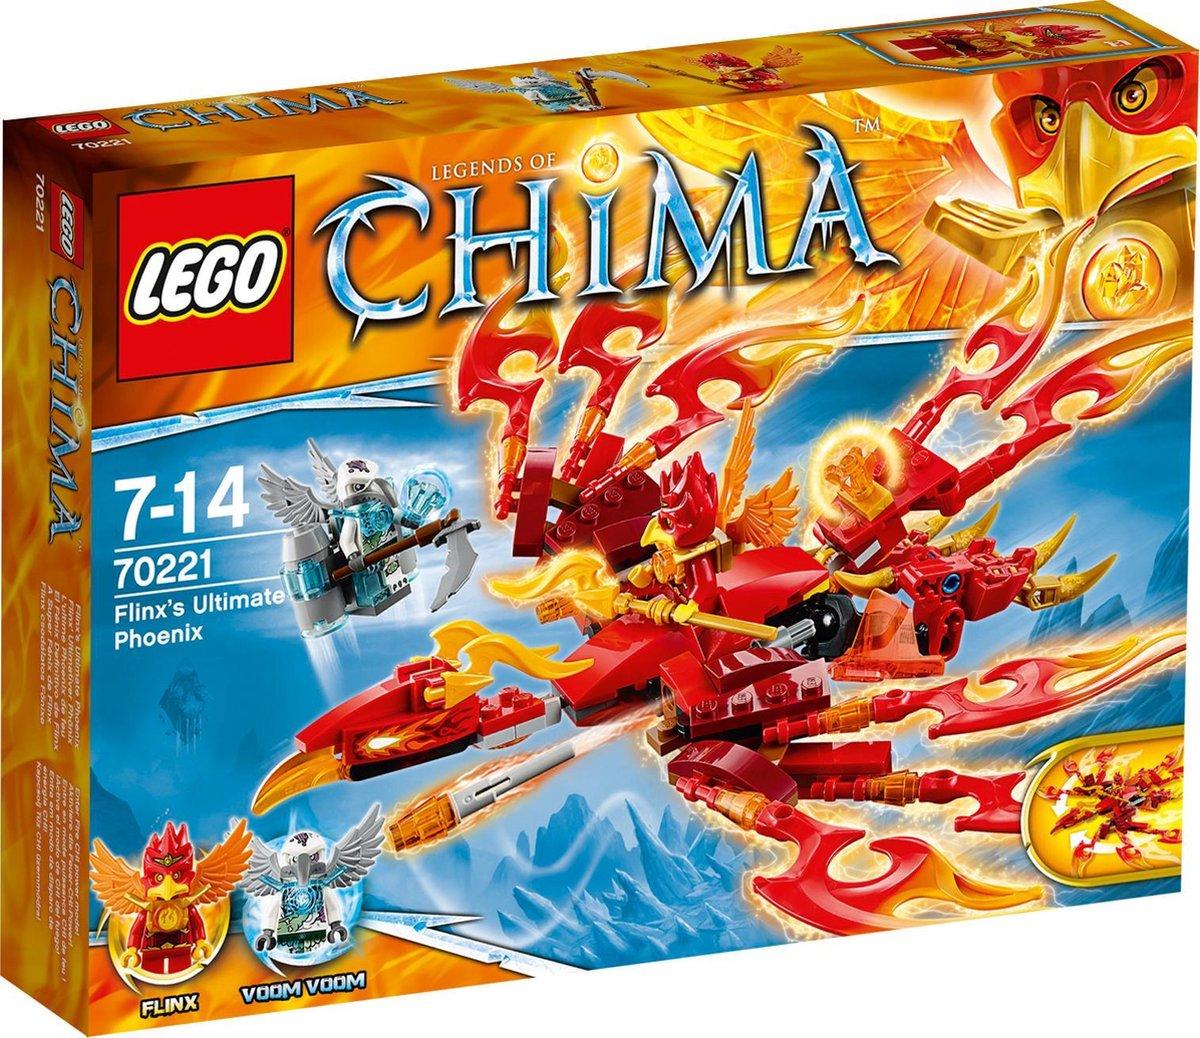 LEGO Chima Flinx?s Ultieme Phoenix - 70221